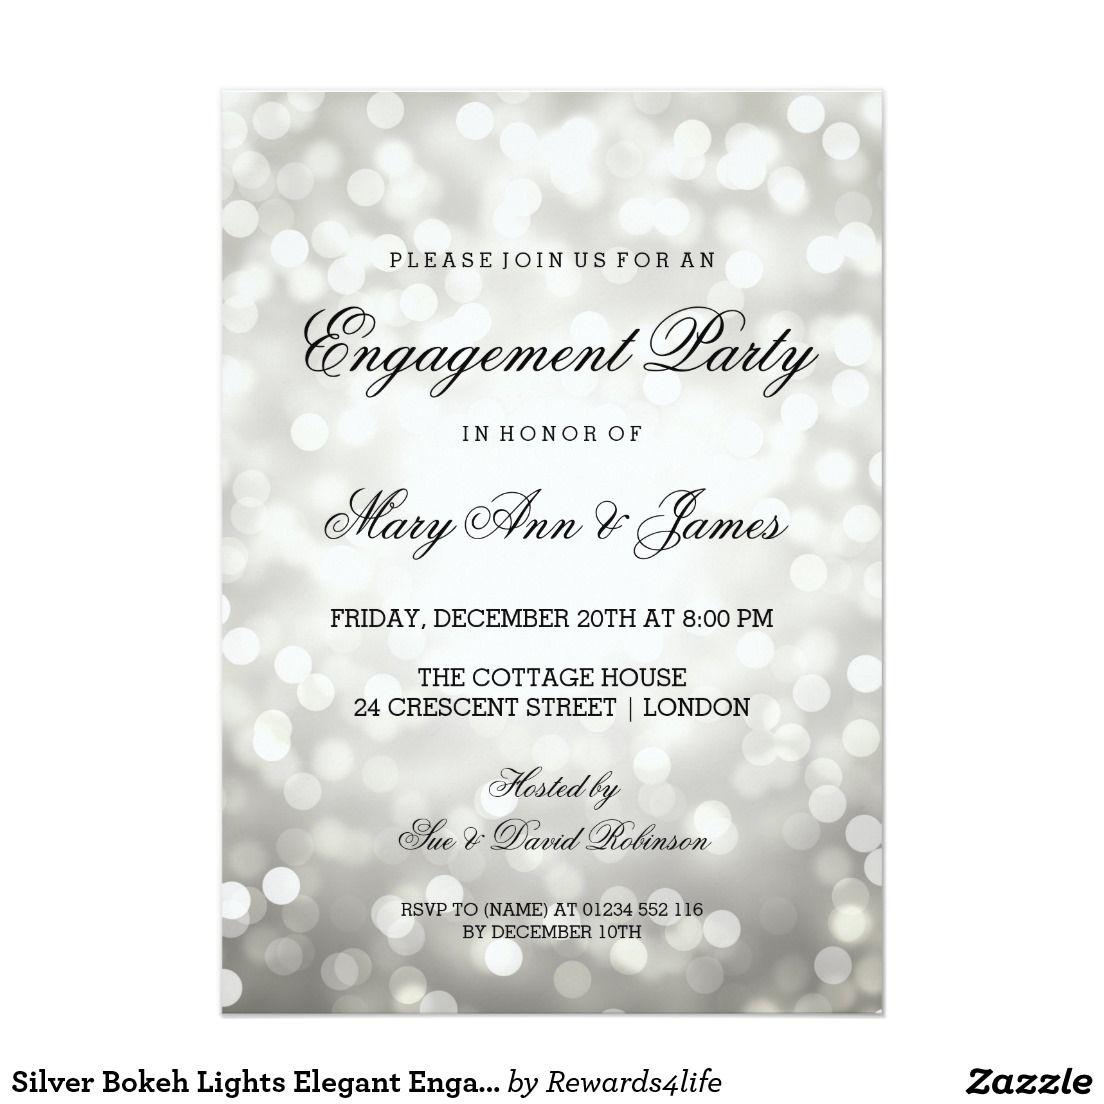 Silver Bokeh Lights Elegant Engagement Party Card | Wedding ...